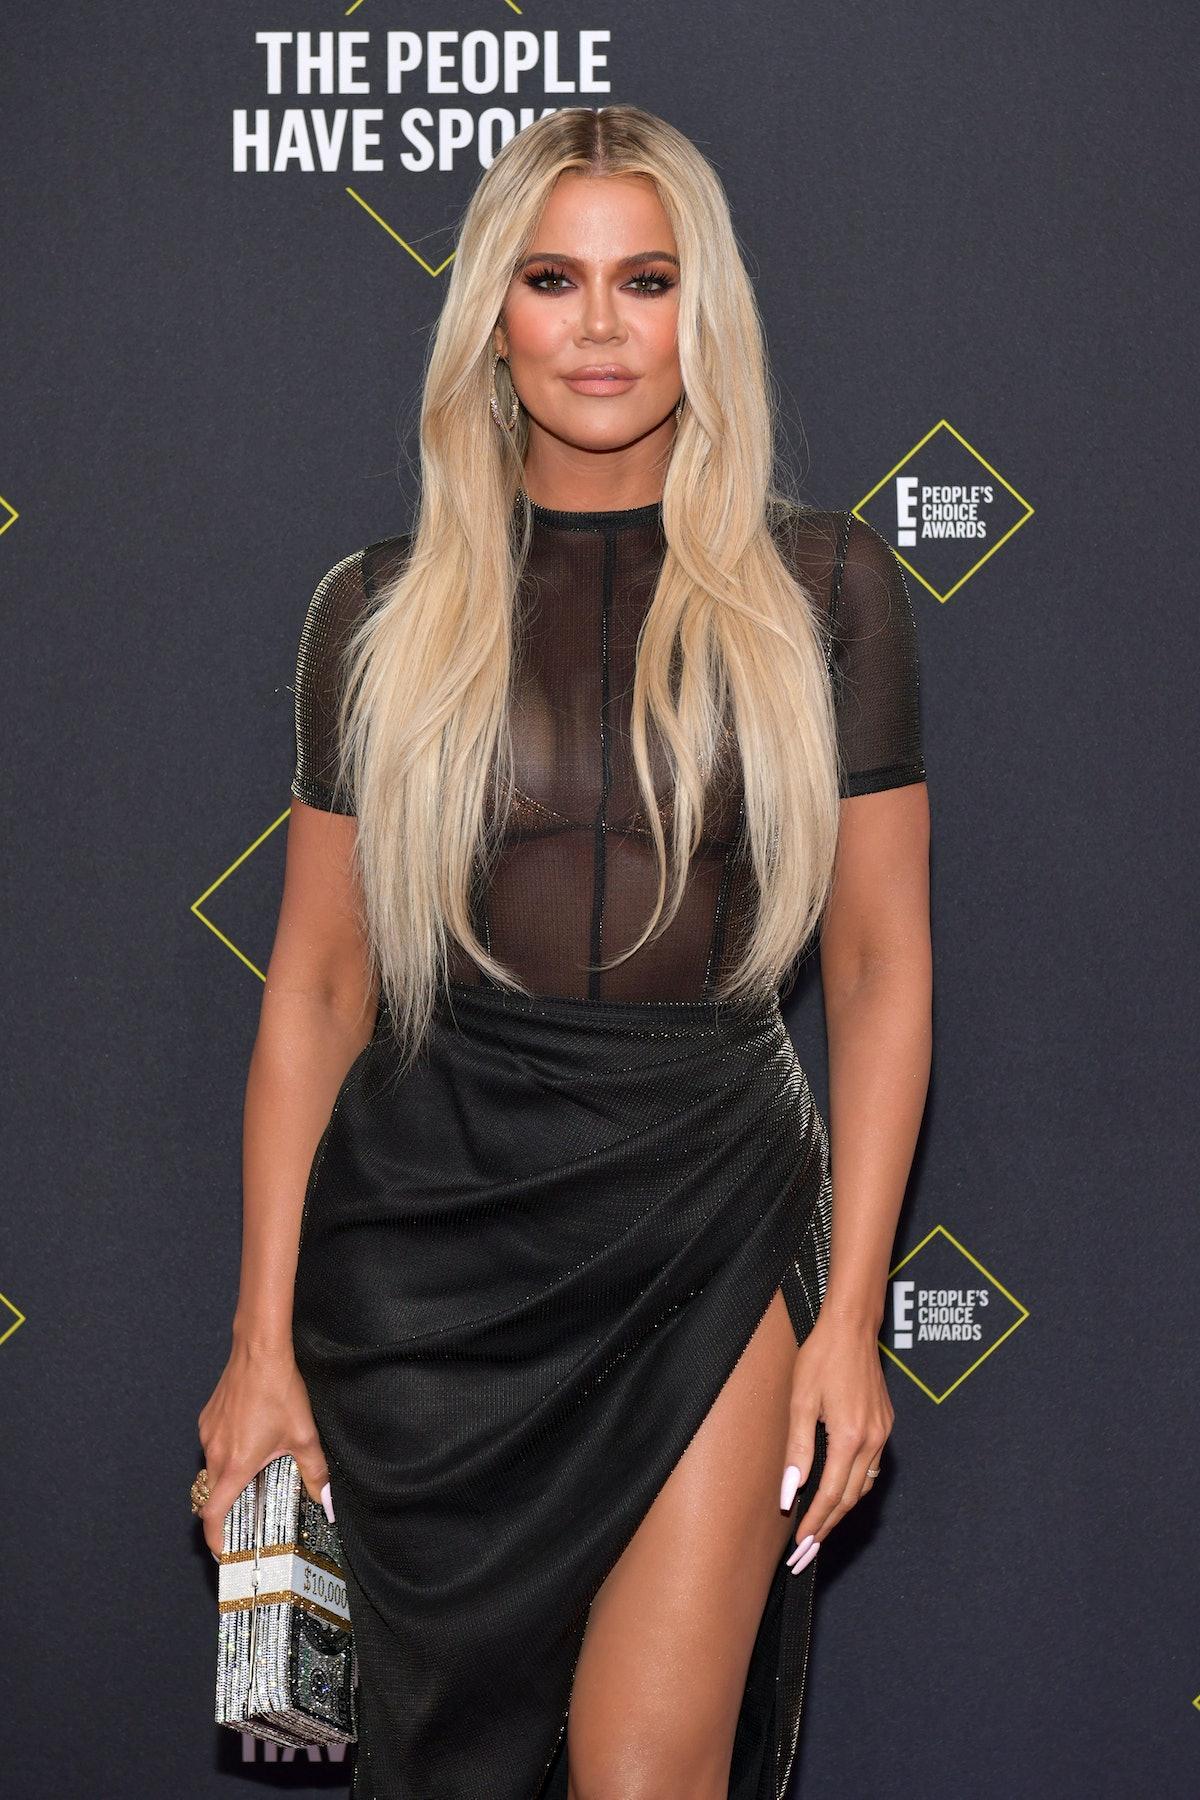 SANTA MONICA, CALIFORNIA - NOVEMBER 10: Khloé Kardashian attends the 2019 E! People's Choice Awards at Barker Hangar on November 10, 2019 in Santa Monica, California. (Photo by Rodin Eckenroth/WireImage)